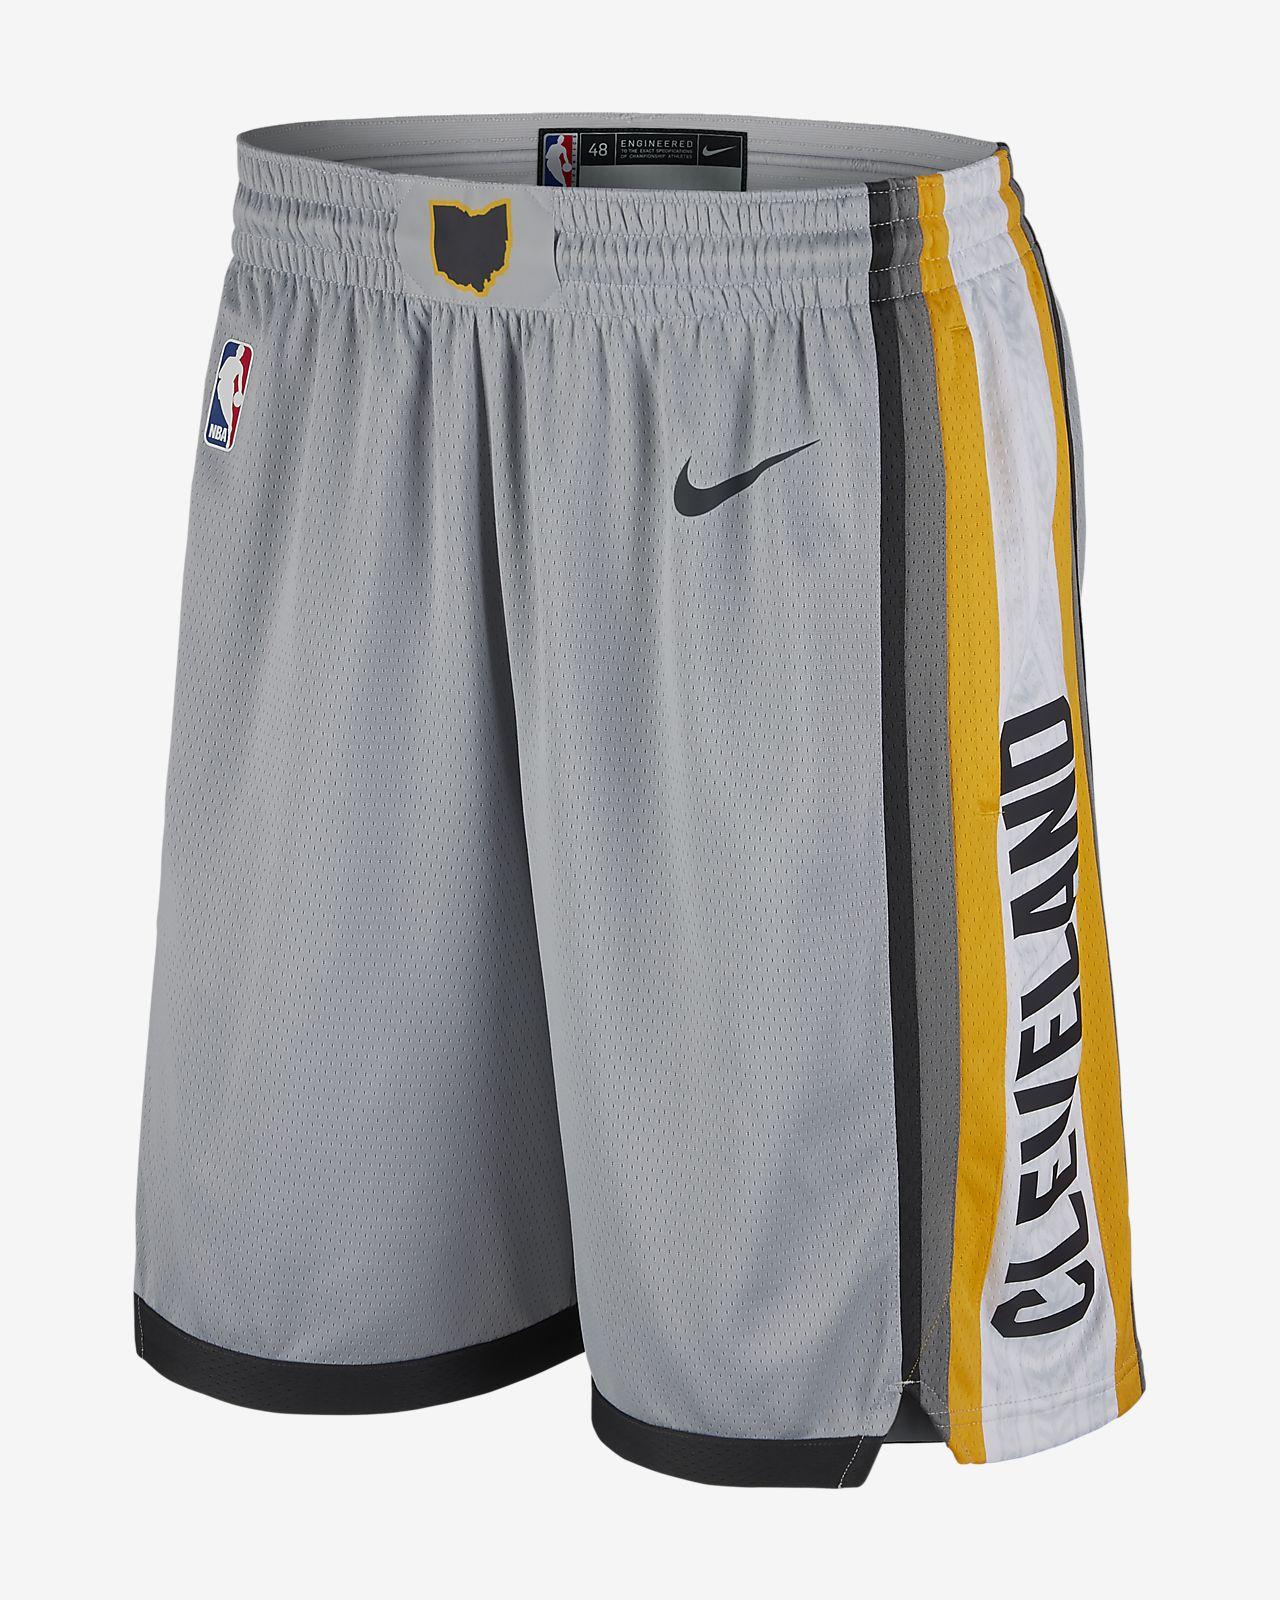 f7b51aef19d7 Cleveland Cavaliers Nike City Edition Swingman Men s NBA Shorts ...